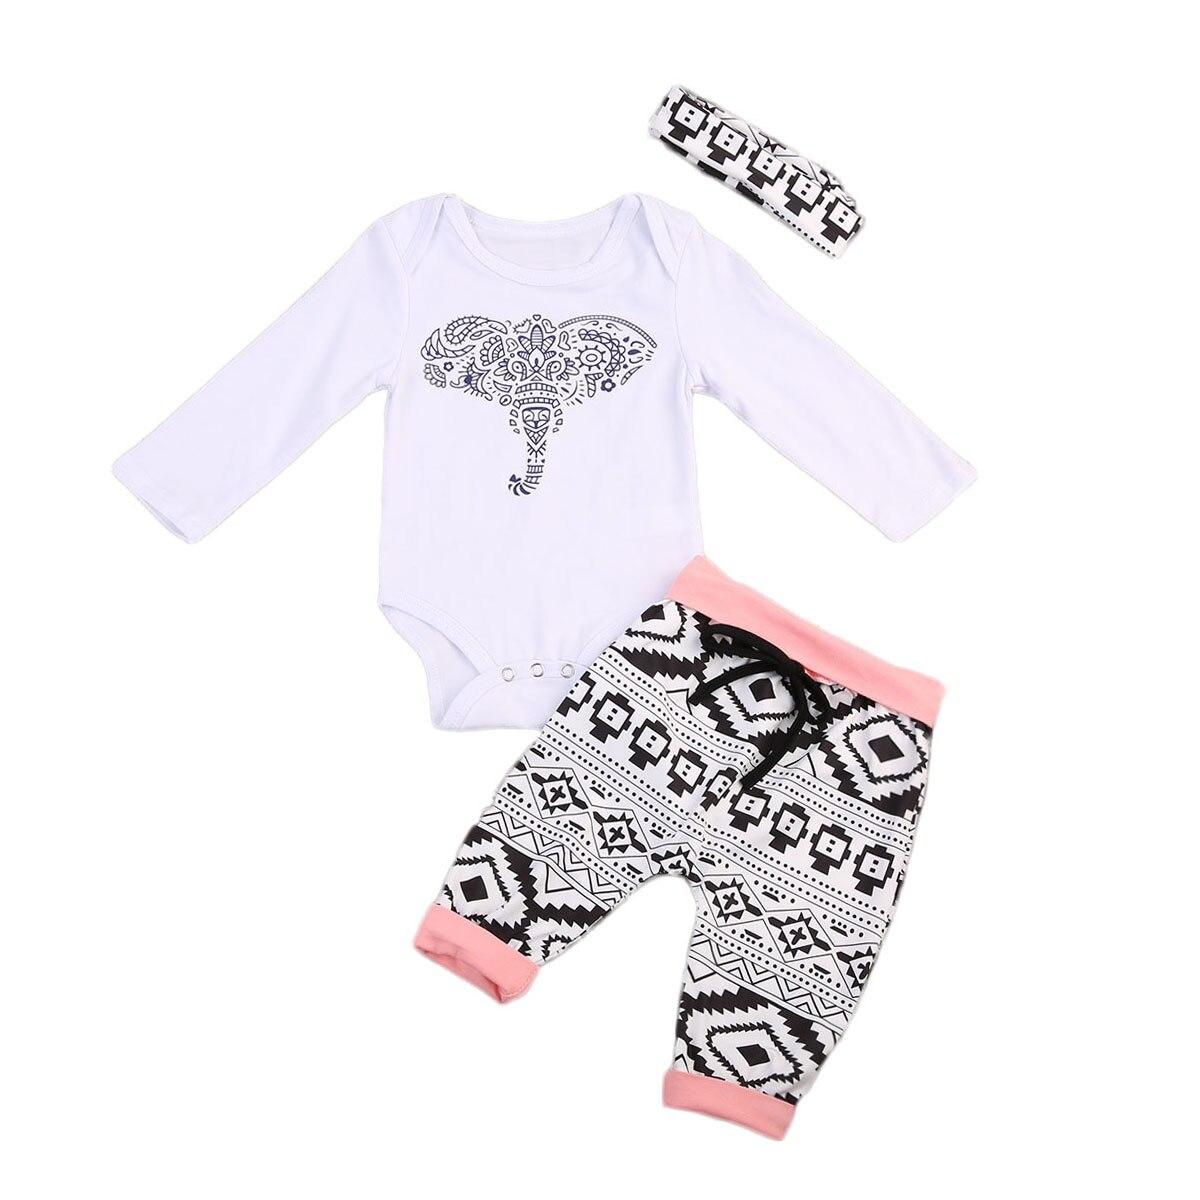 Cute Newborn Baby Boy Girl Romper Suit Elephant Tops+Long Pants Headband 3pcs Outfits Set